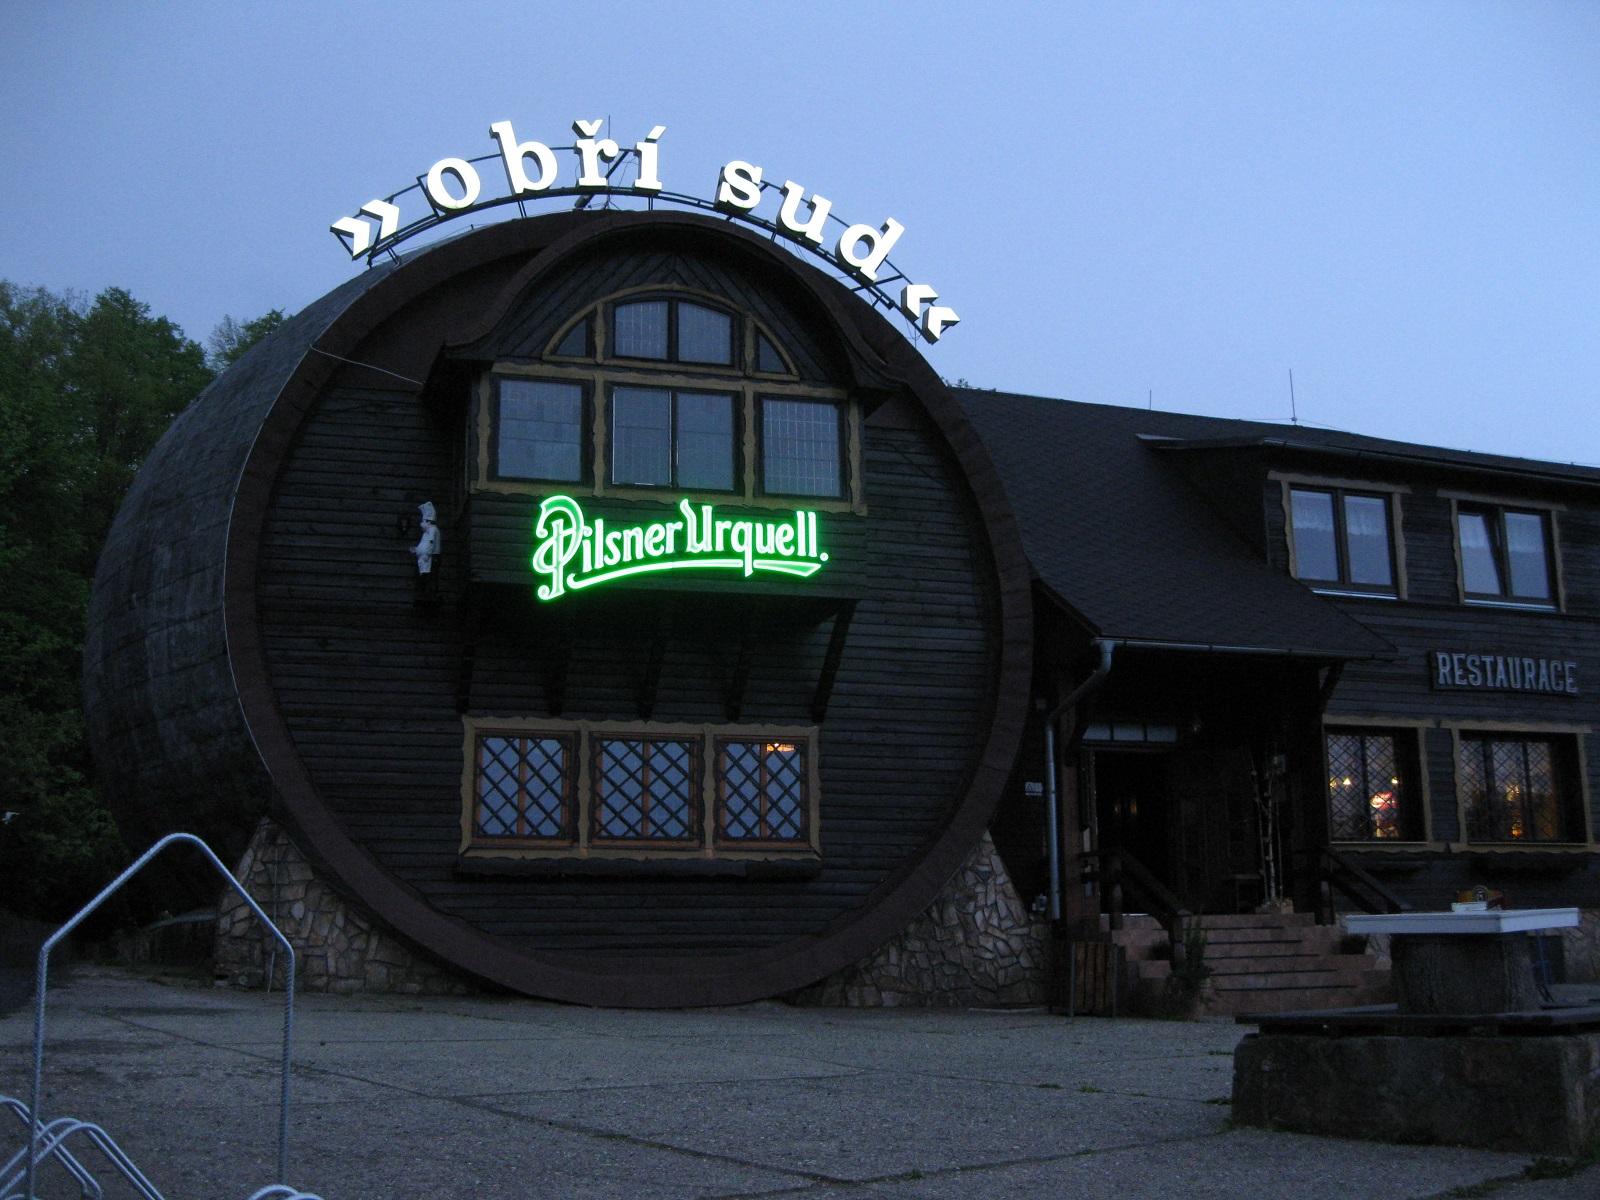 Restaurace Obří sud, Lázně Libverda